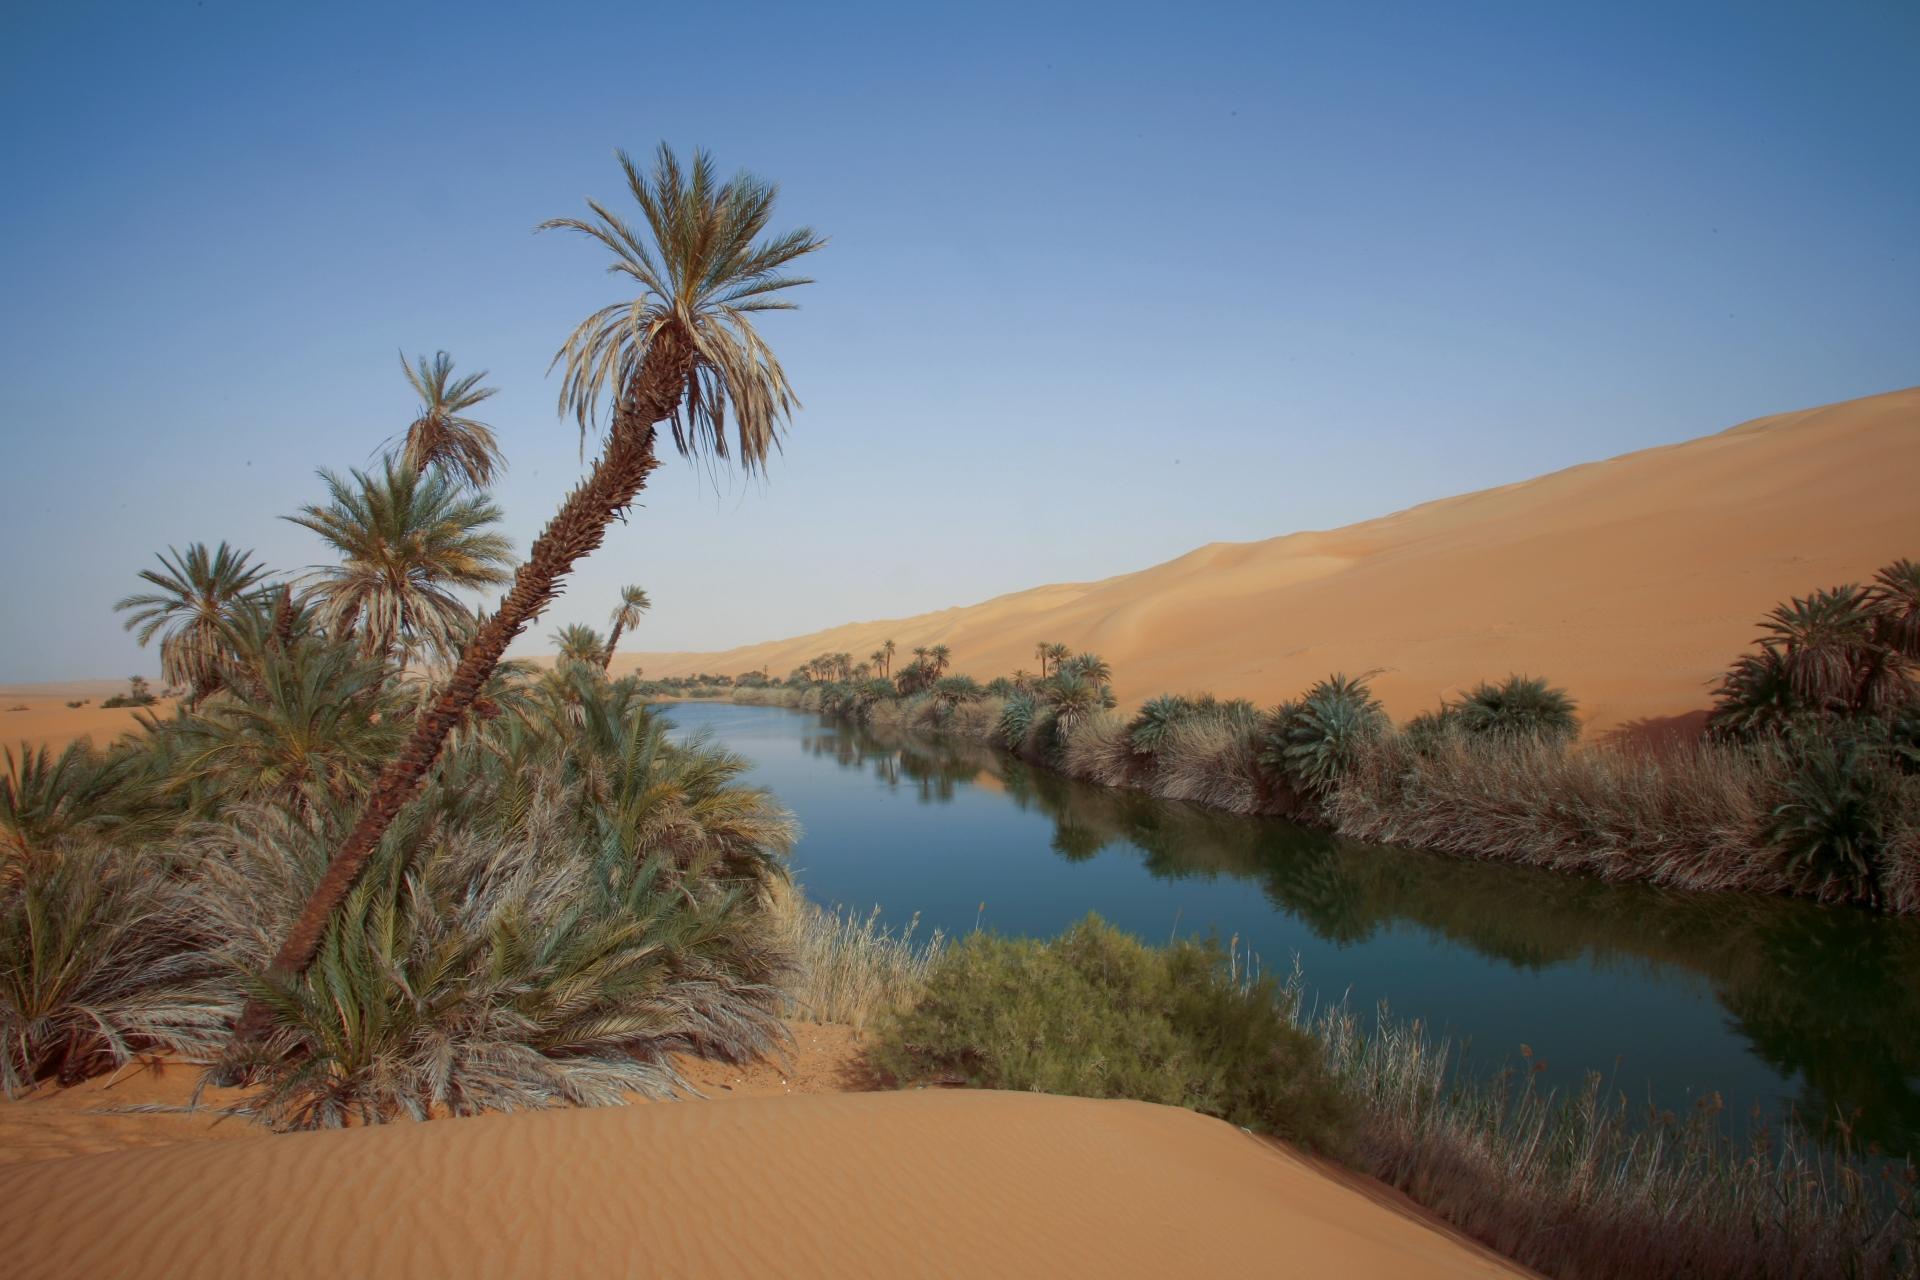 Libya 2007 # 07